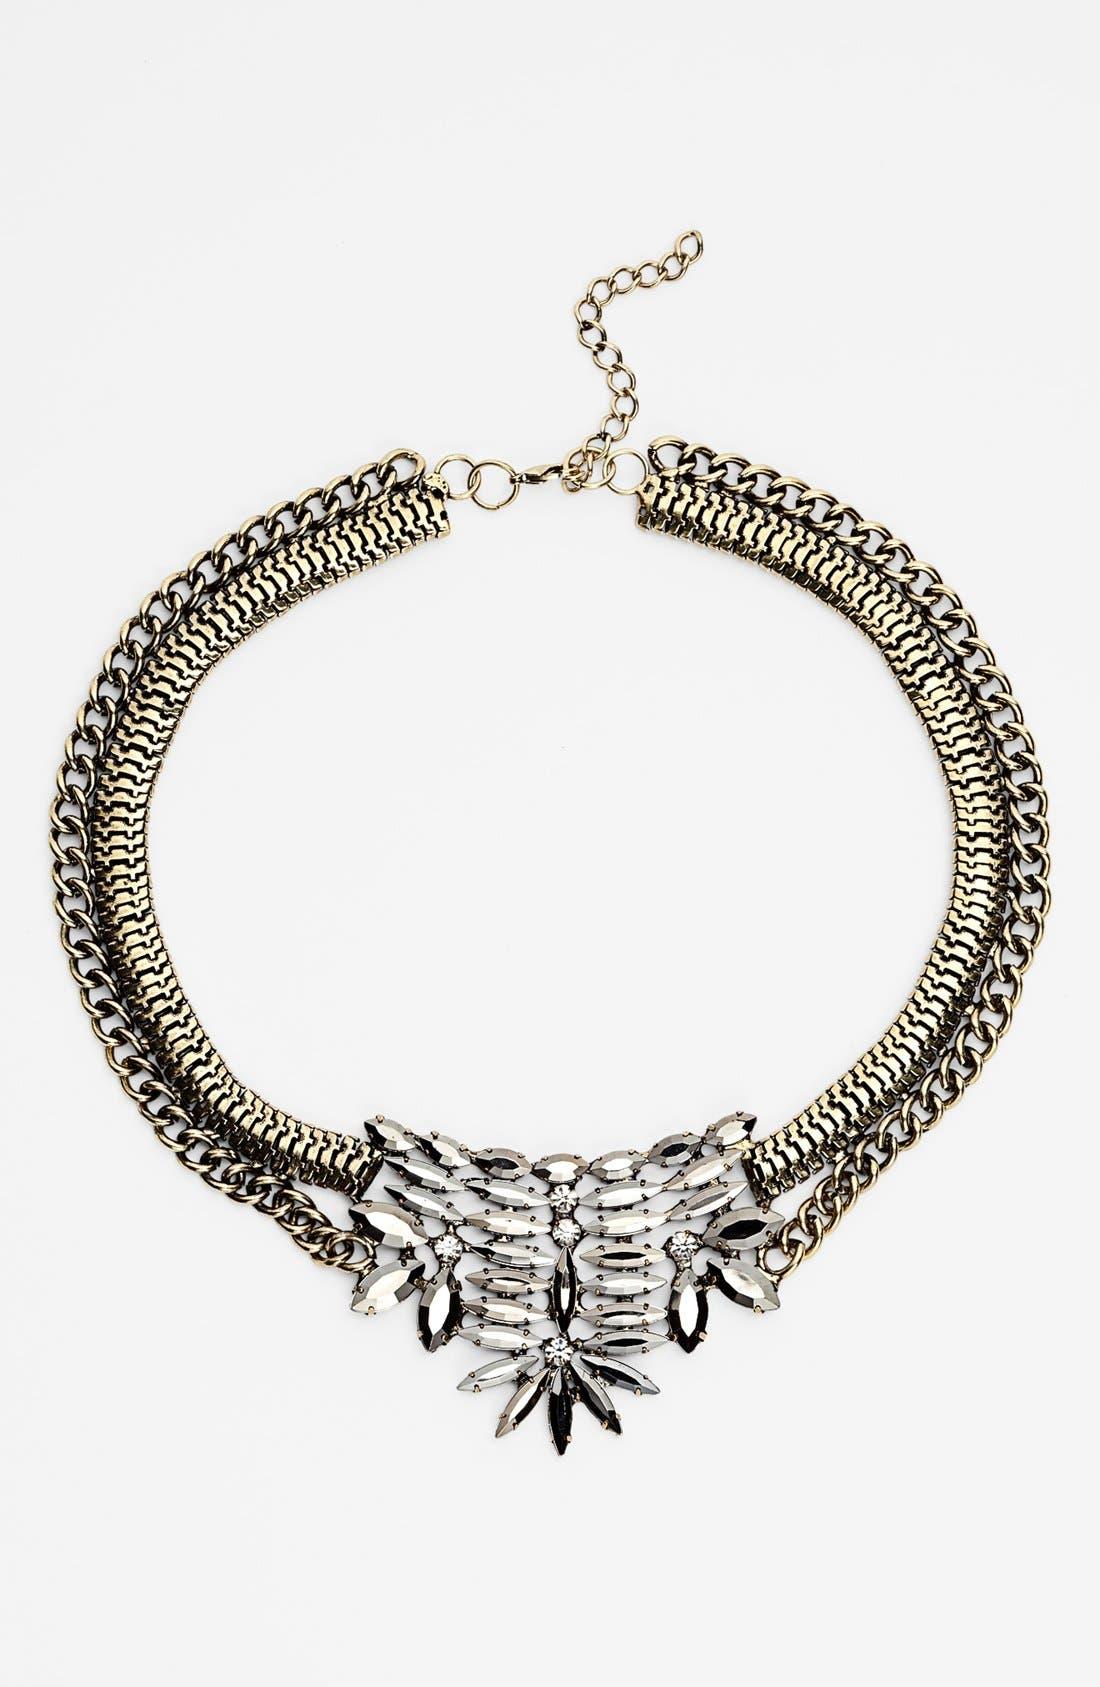 Alternate Image 1 Selected - Tildon 'Kitsch' Statement Necklace